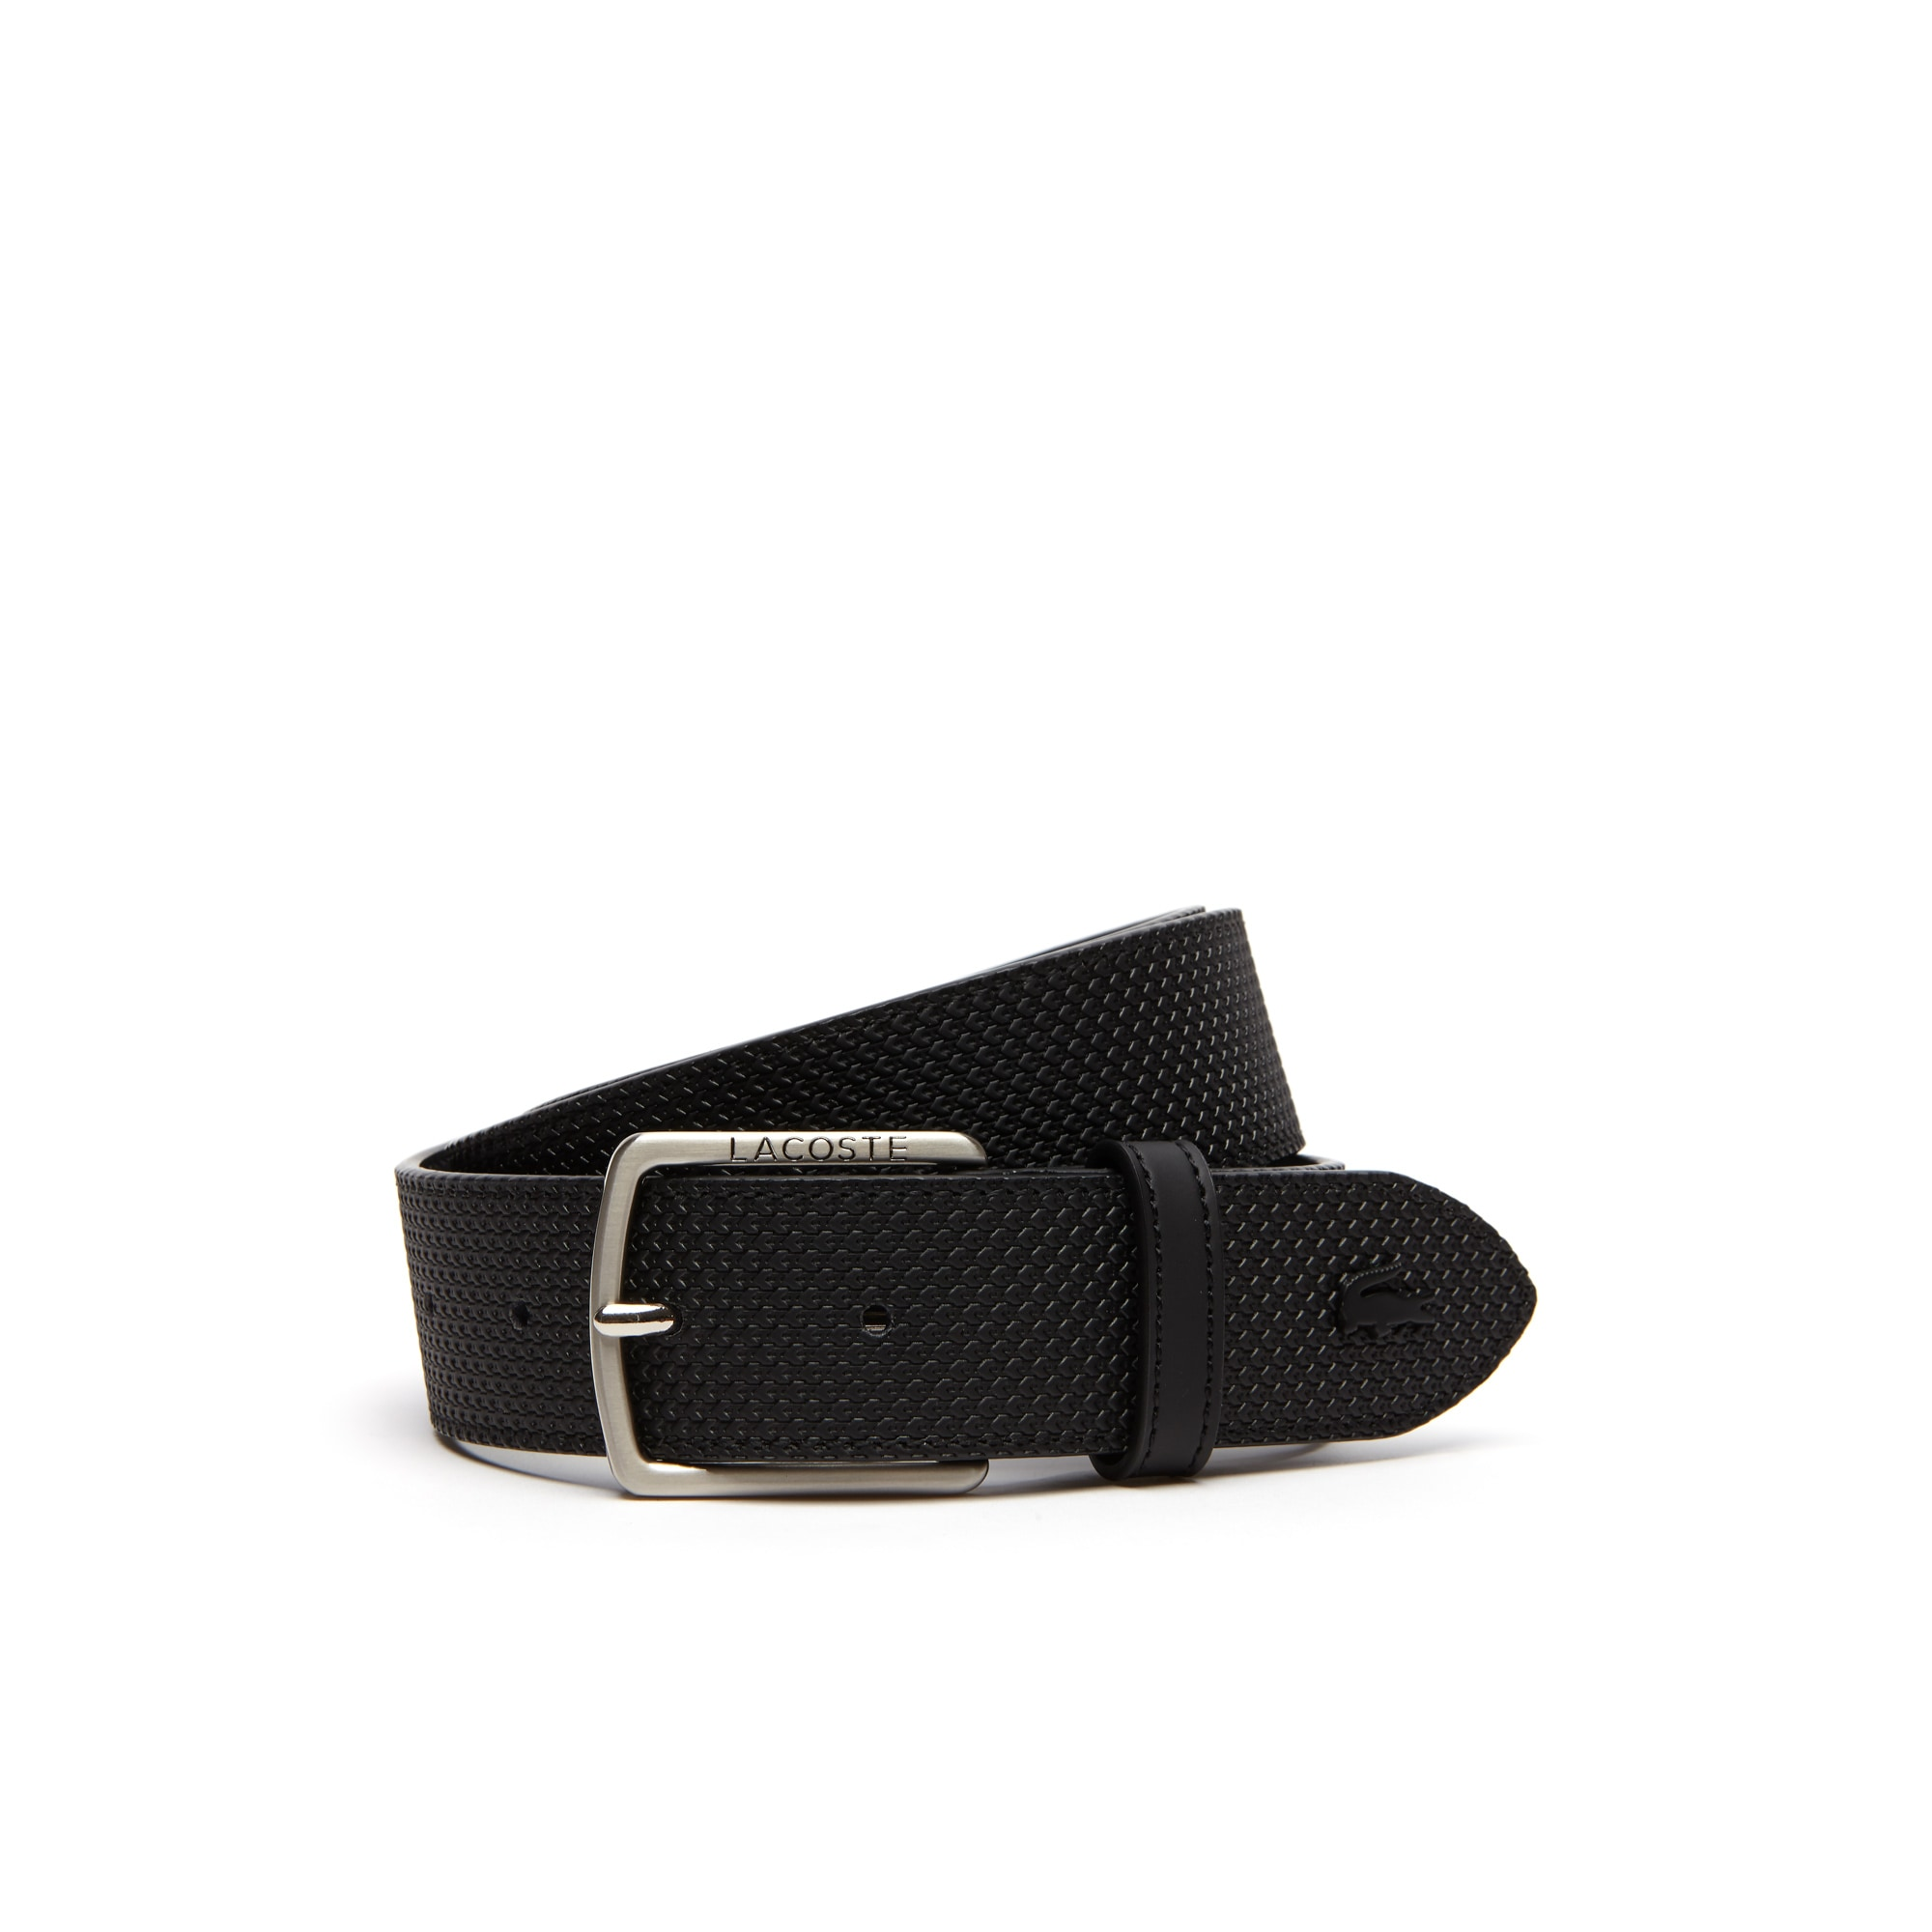 Men's Chantaco Lacoste Engraved Tongue Buckle Leather Belt